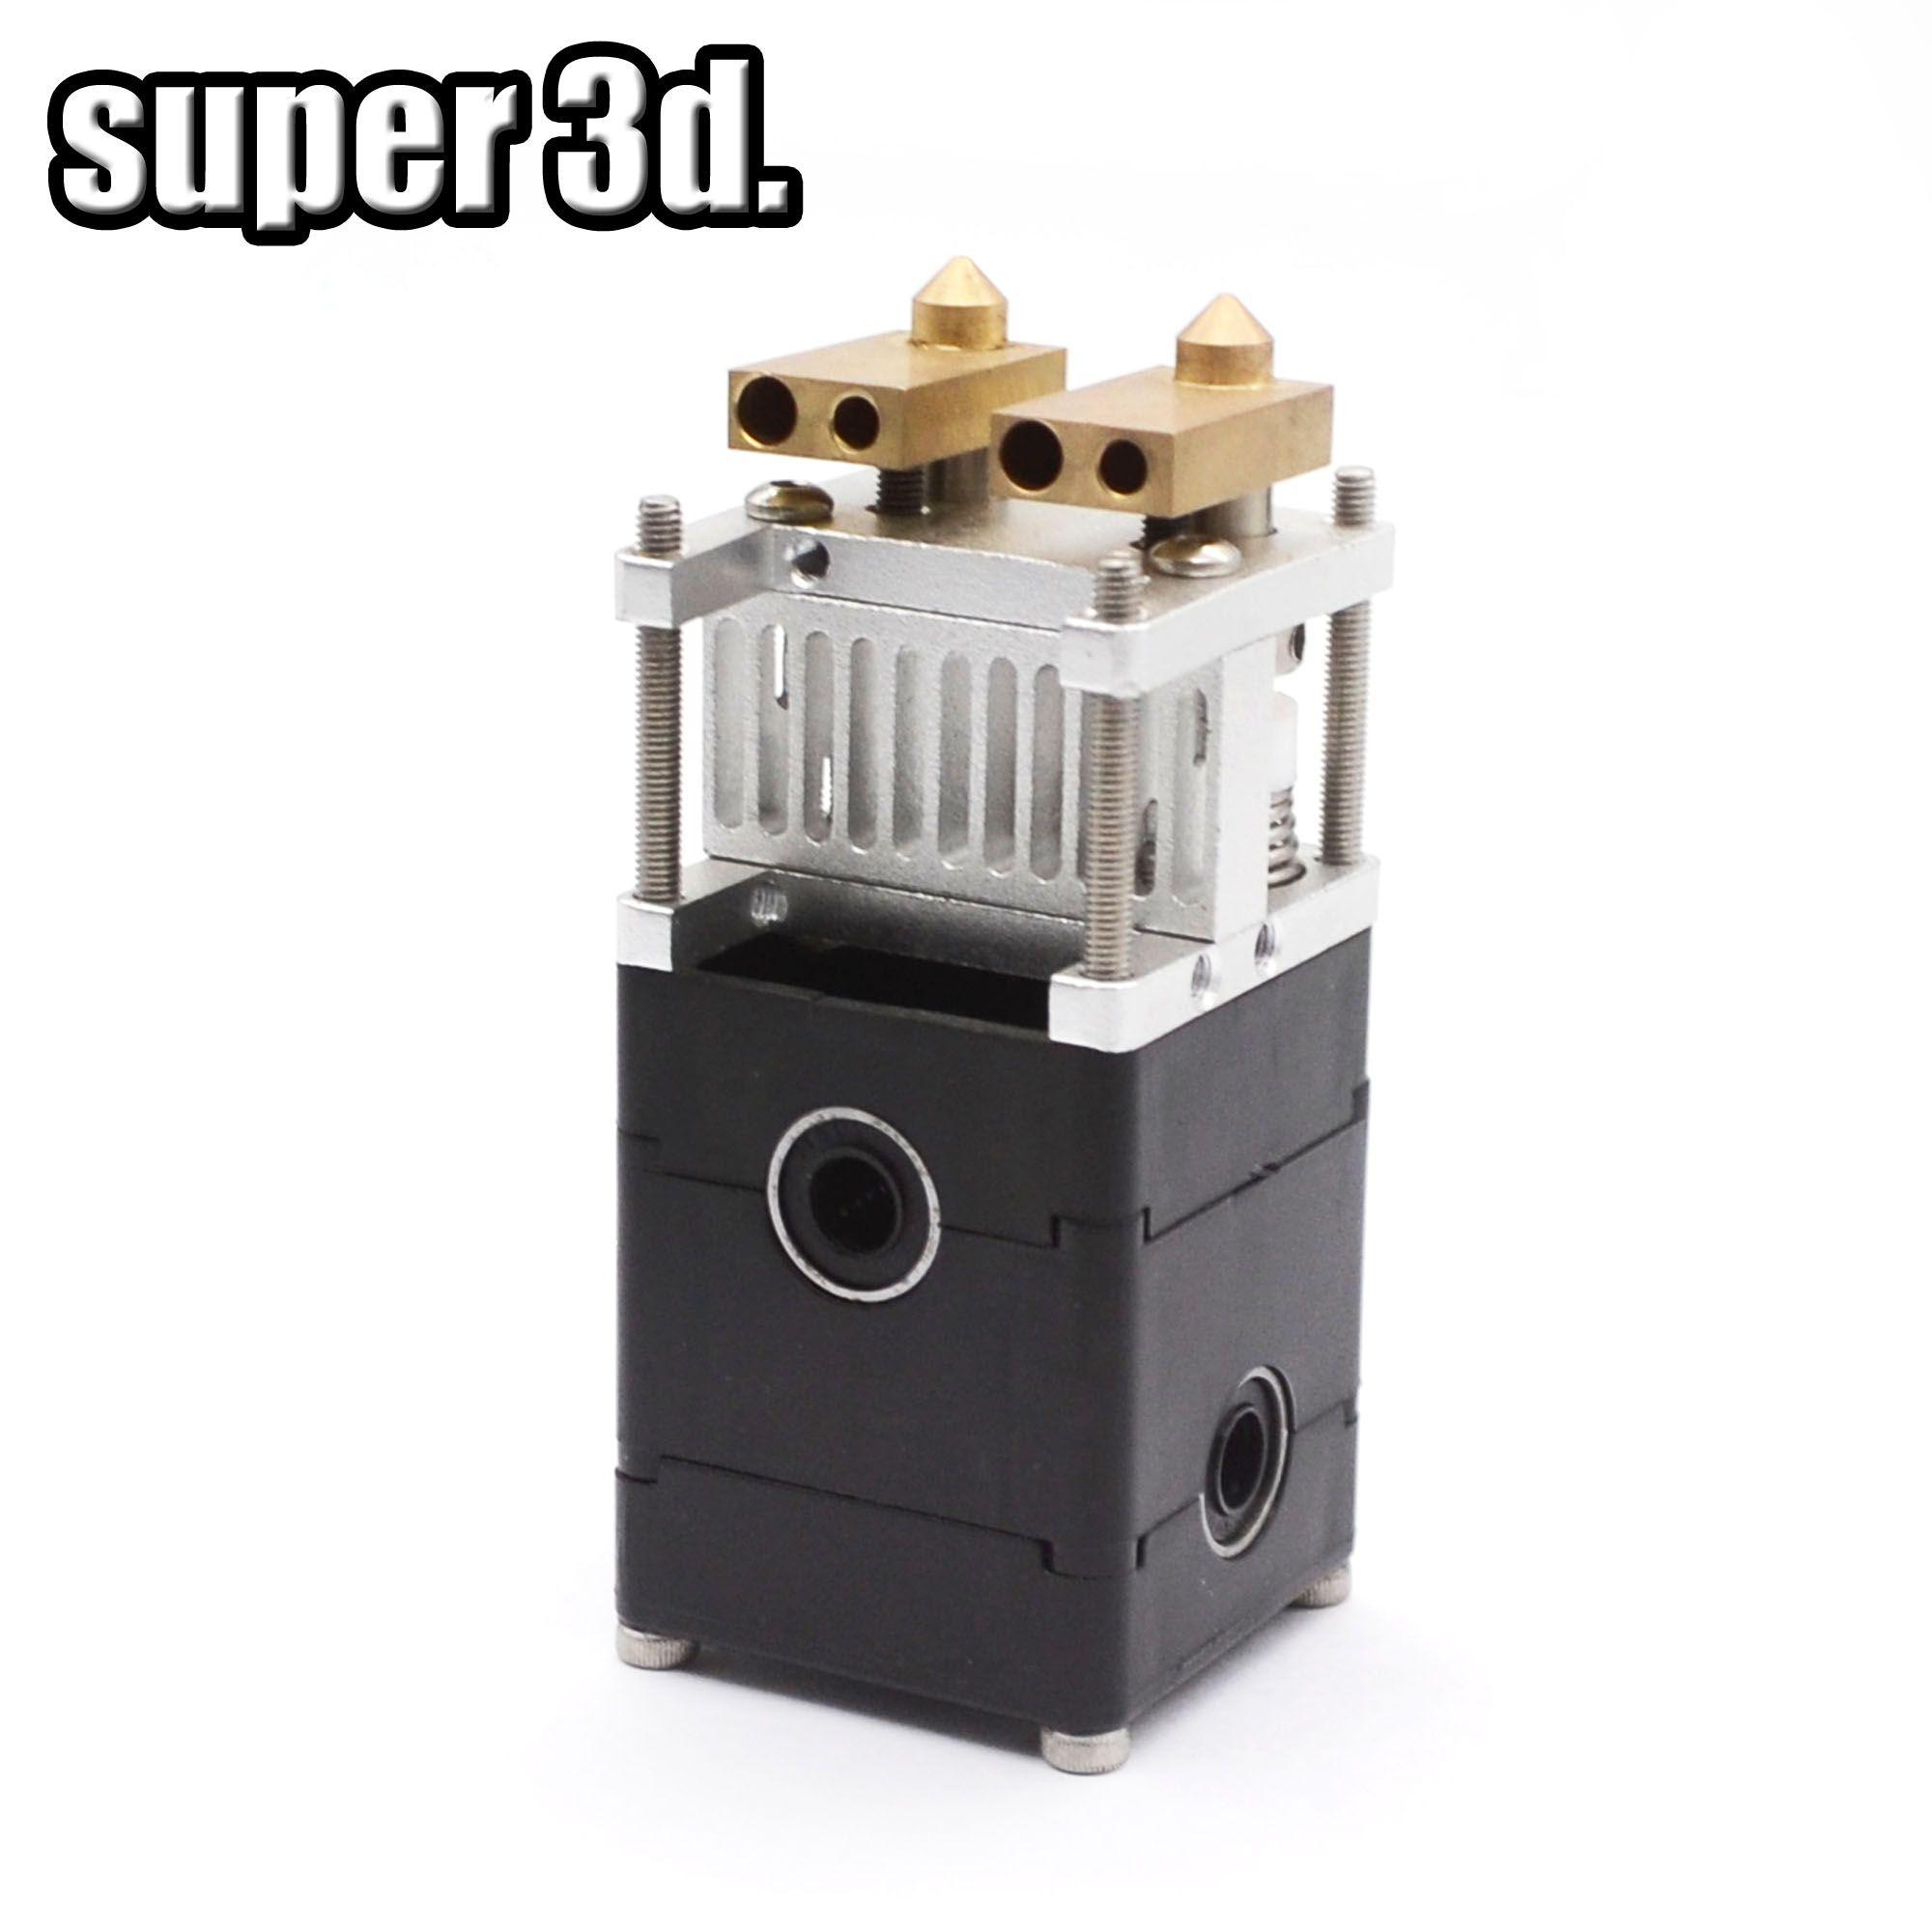 UM2 Ultimaker 2 3D Drucker Dual Extrusion Kit 2 Dual Köpfe Extruder für 3mm/1,75mm Ultimaker 2 0,4mm Düse